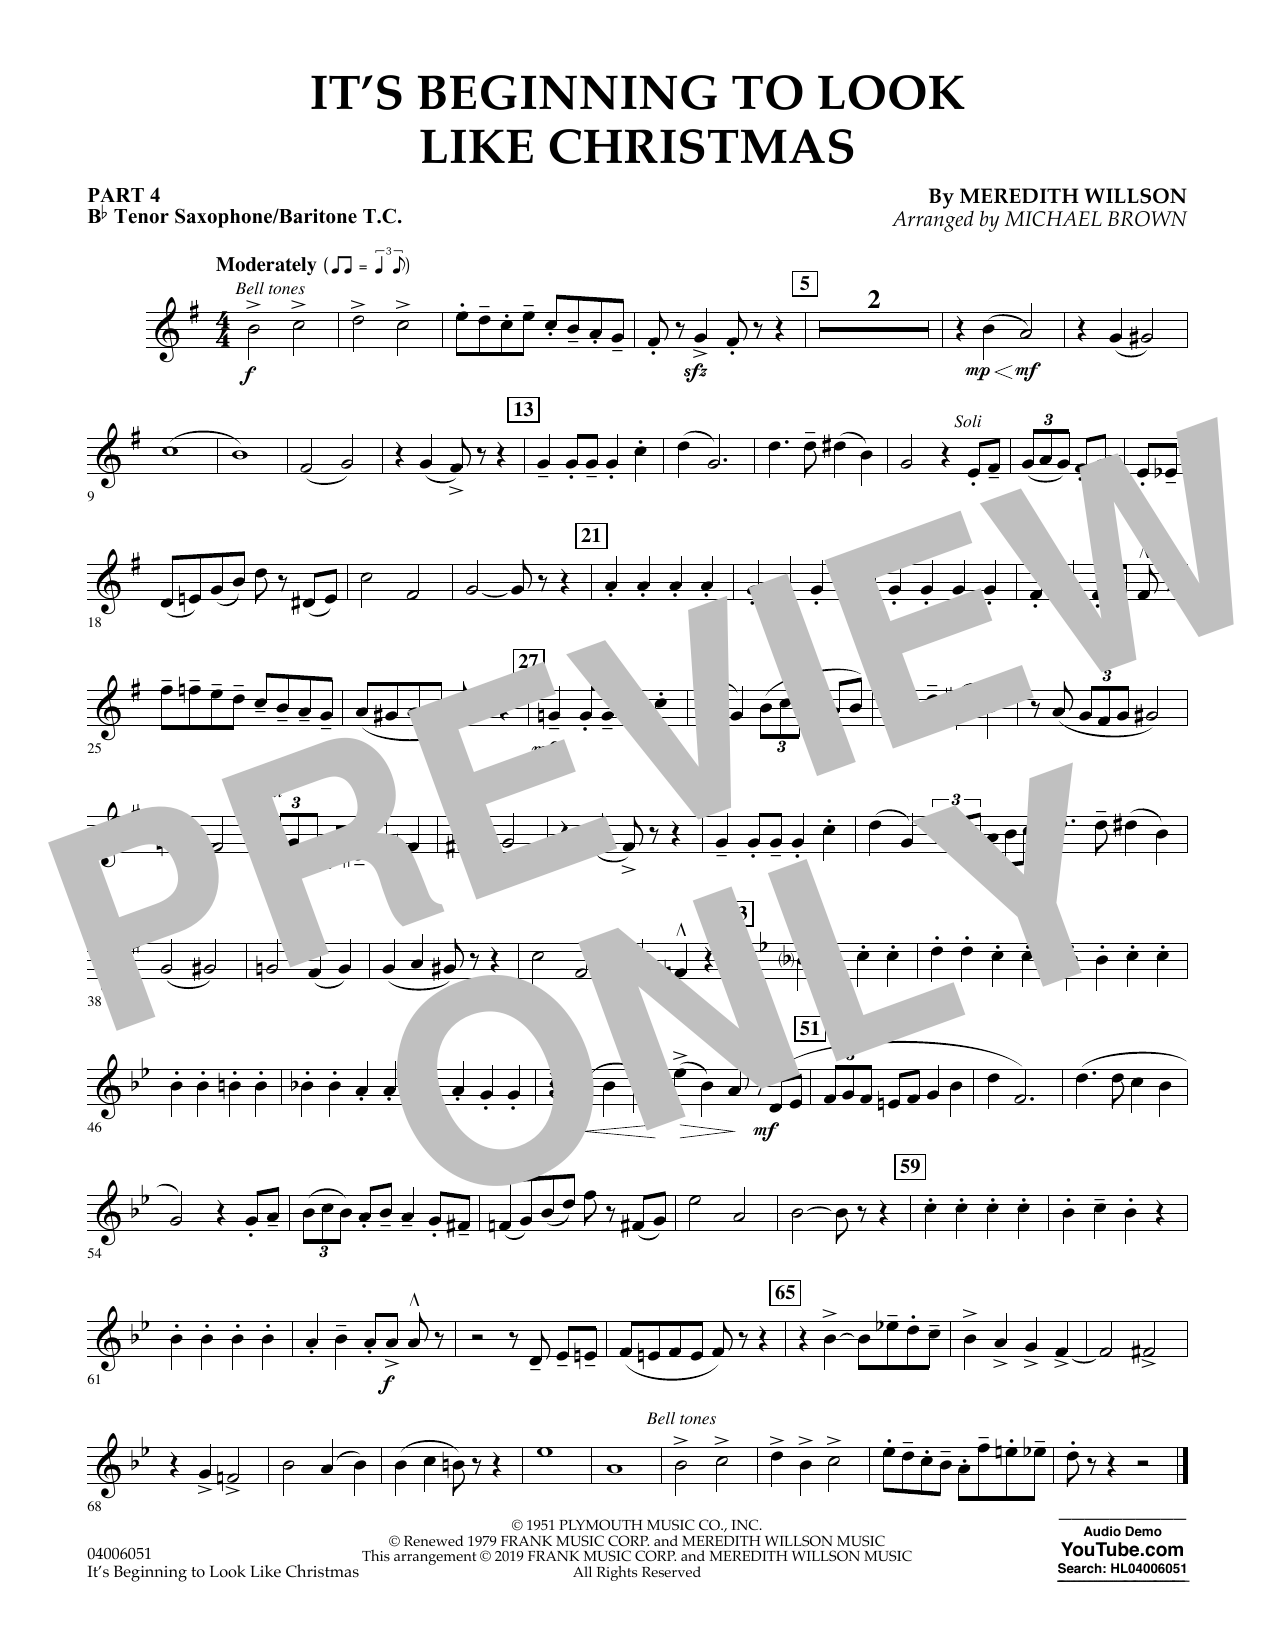 It's Beginning to Look Like Christmas (arr. Michael Brown) - Pt.4 - Bb Tenor Sax/Bar. T.C. (Flex-Band)